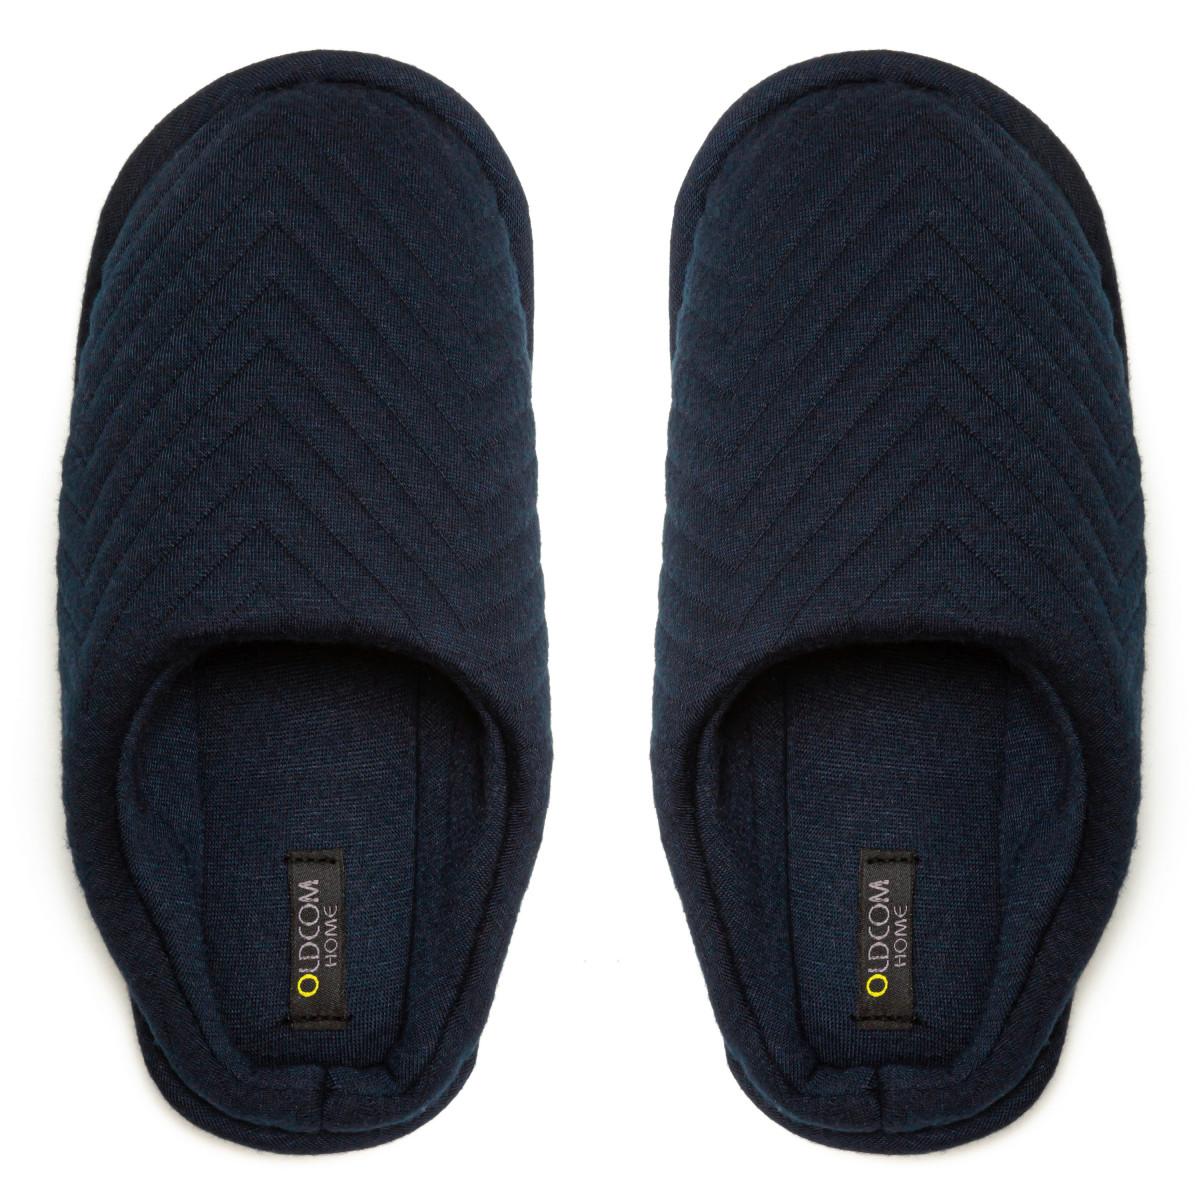 Kid's home slippers FAMILY, Navy